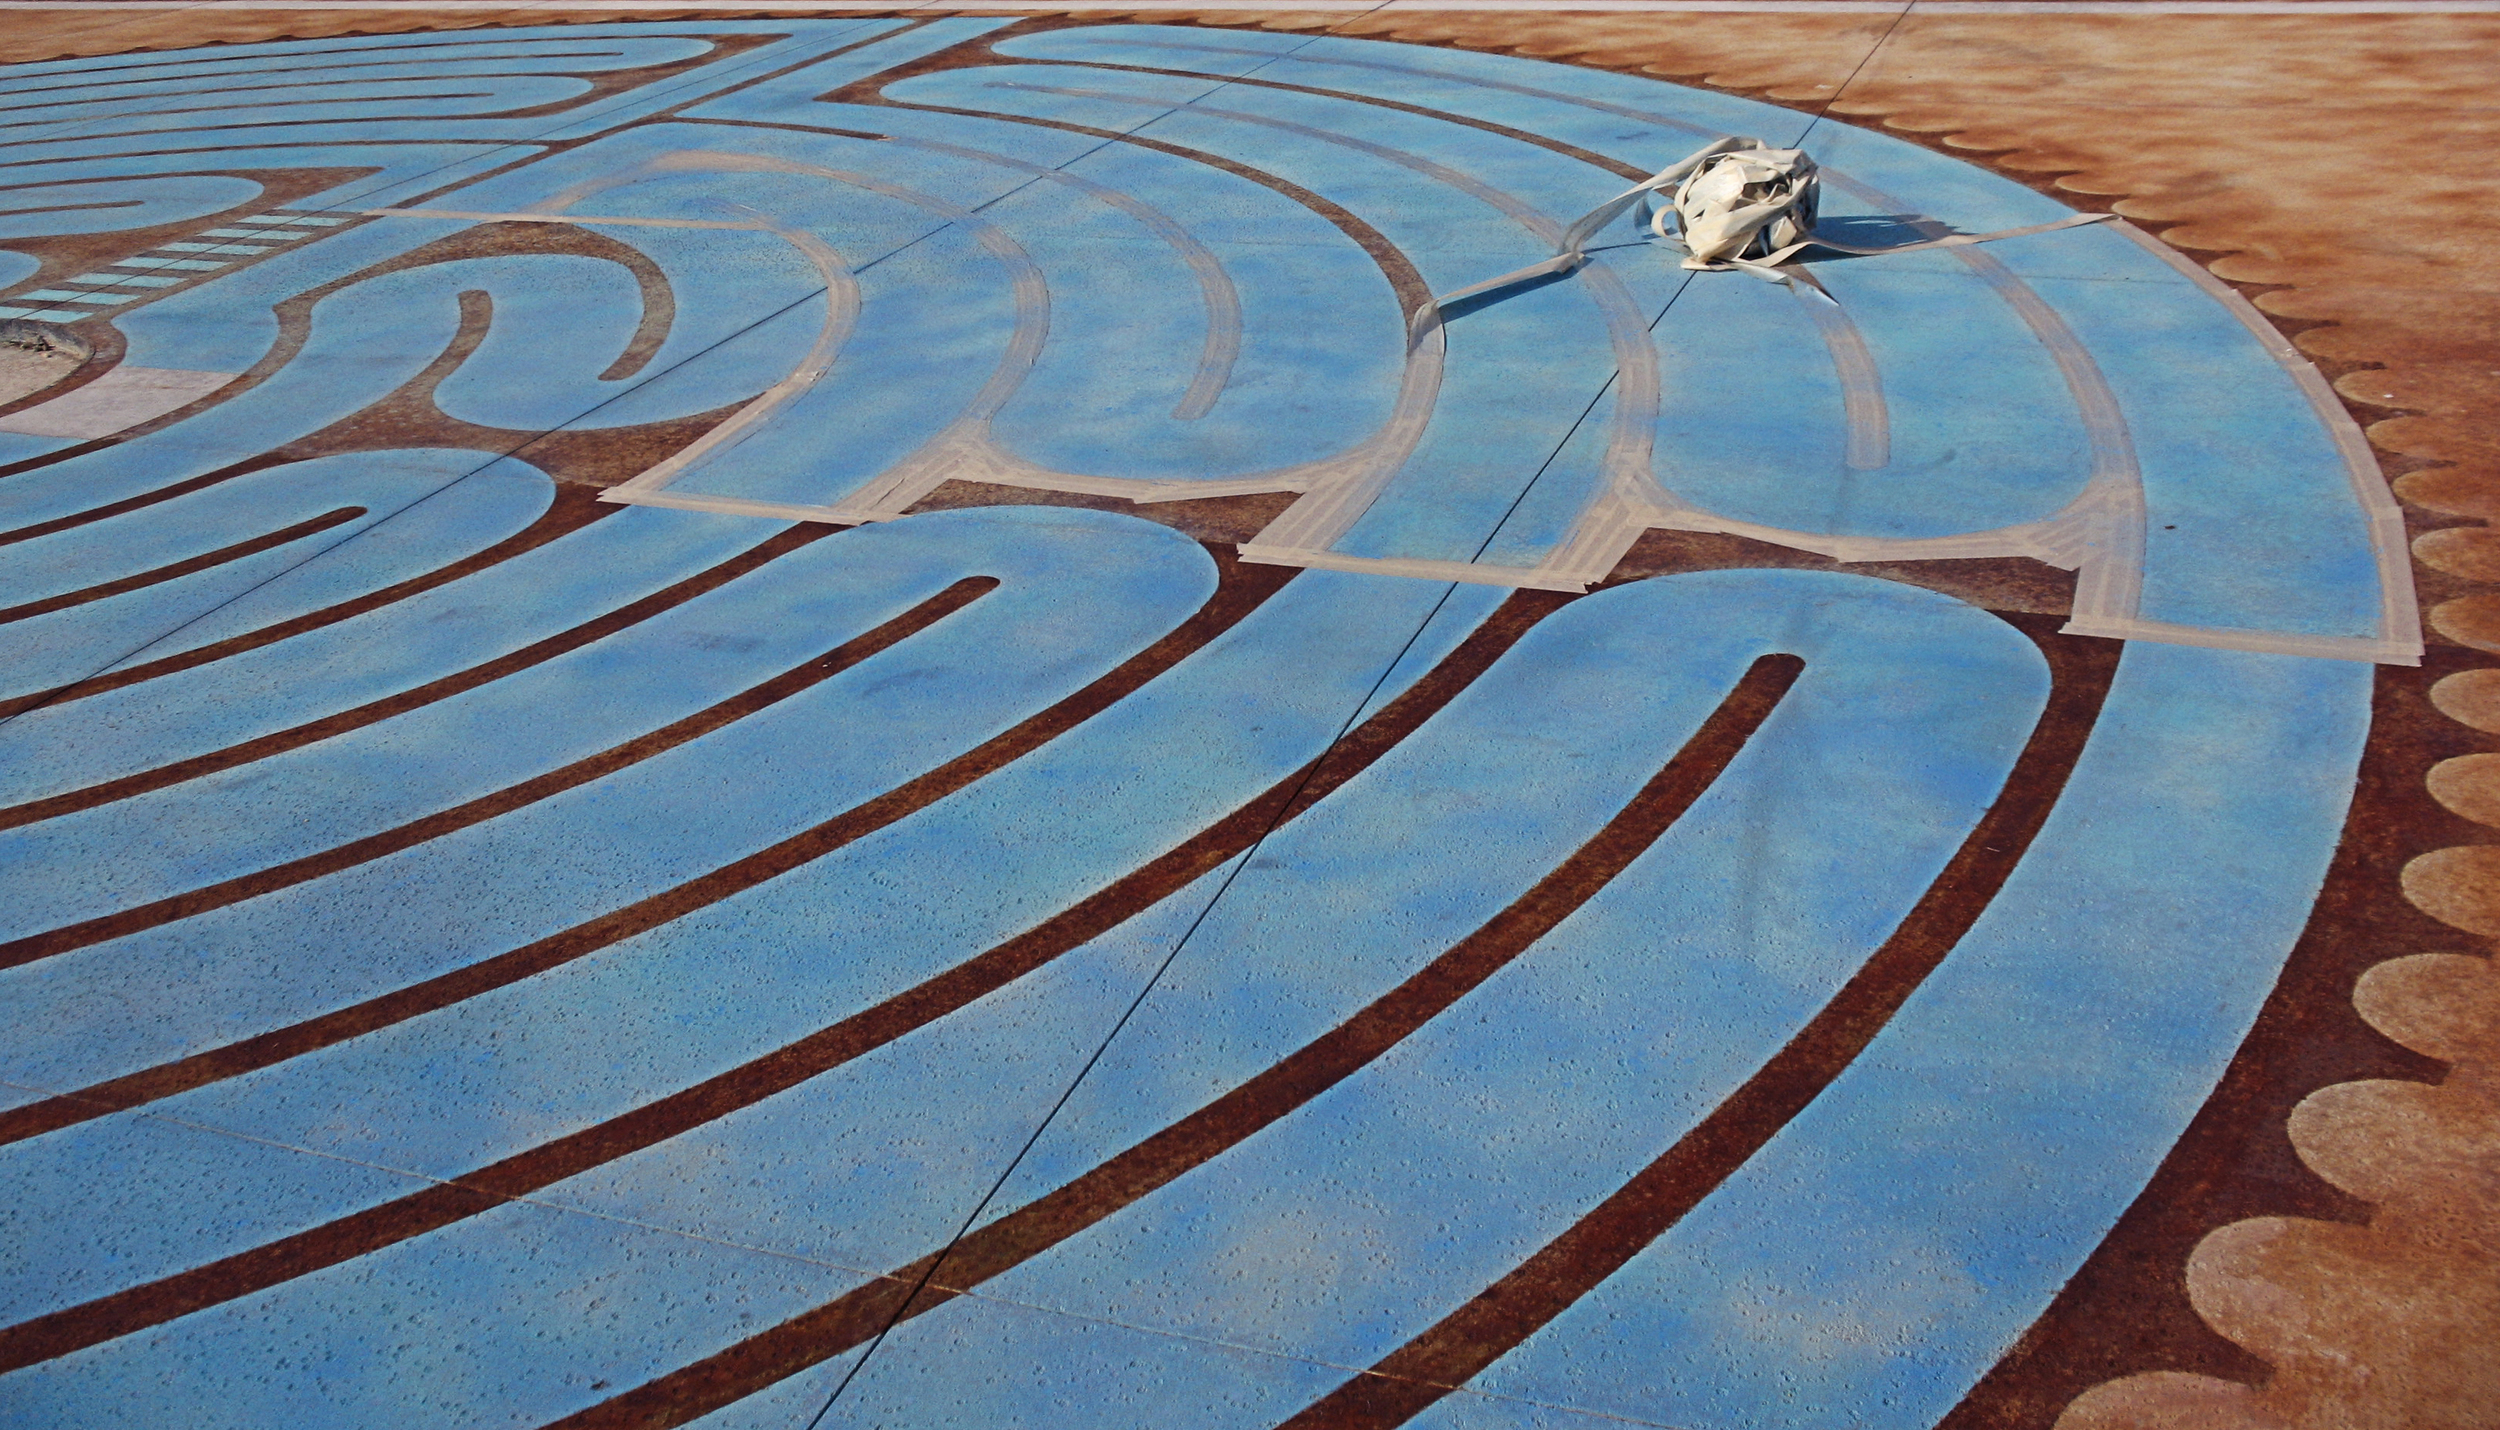 The AHA labyrinth in progress, Charlotte NC.